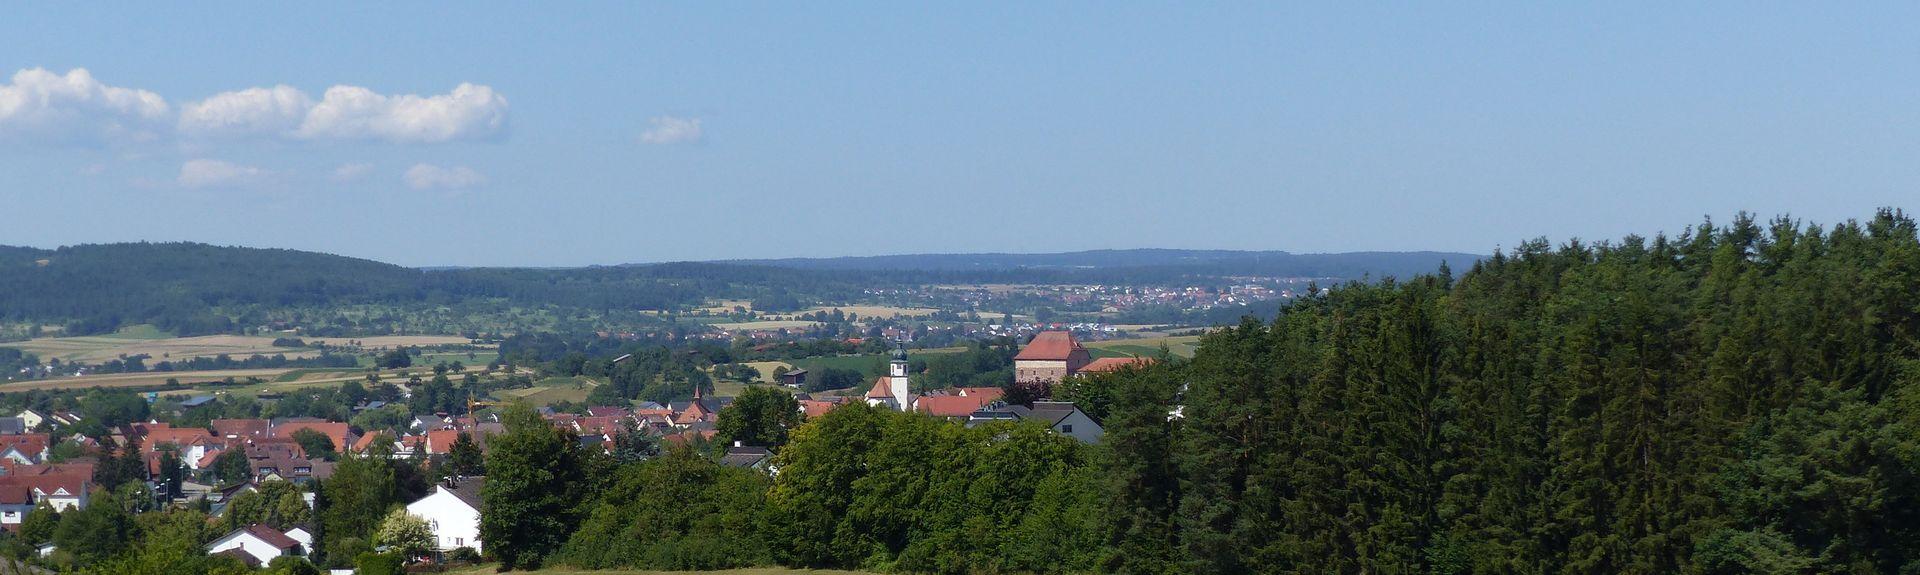 Muehlacker, Baden-Württemberg, Saksa